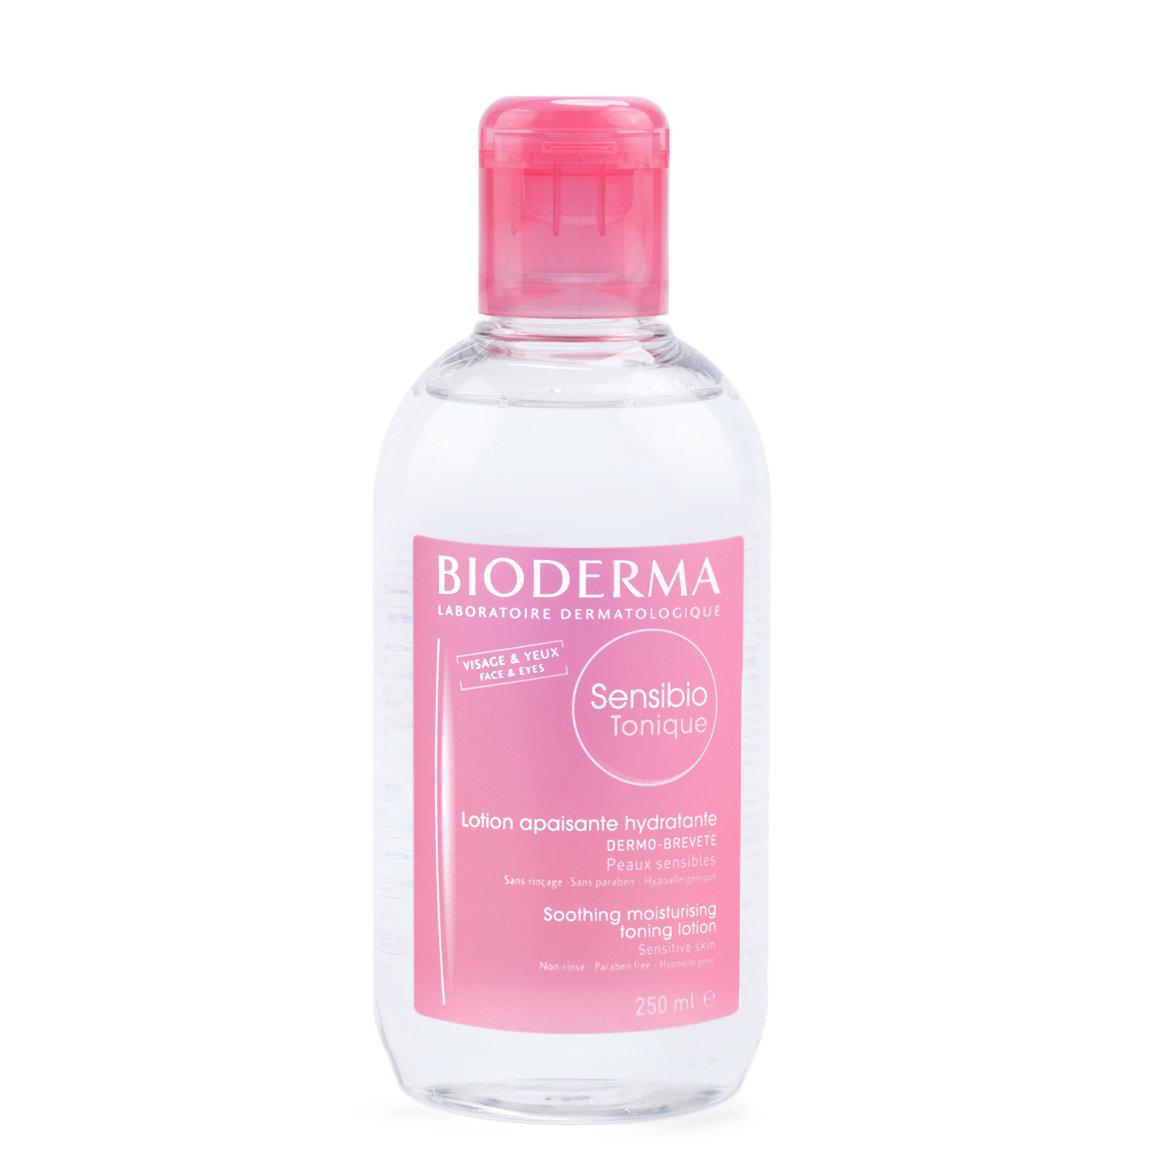 Bioderma Sensibio Tonic Lotion 250 ml alternative view 1 - product swatch.